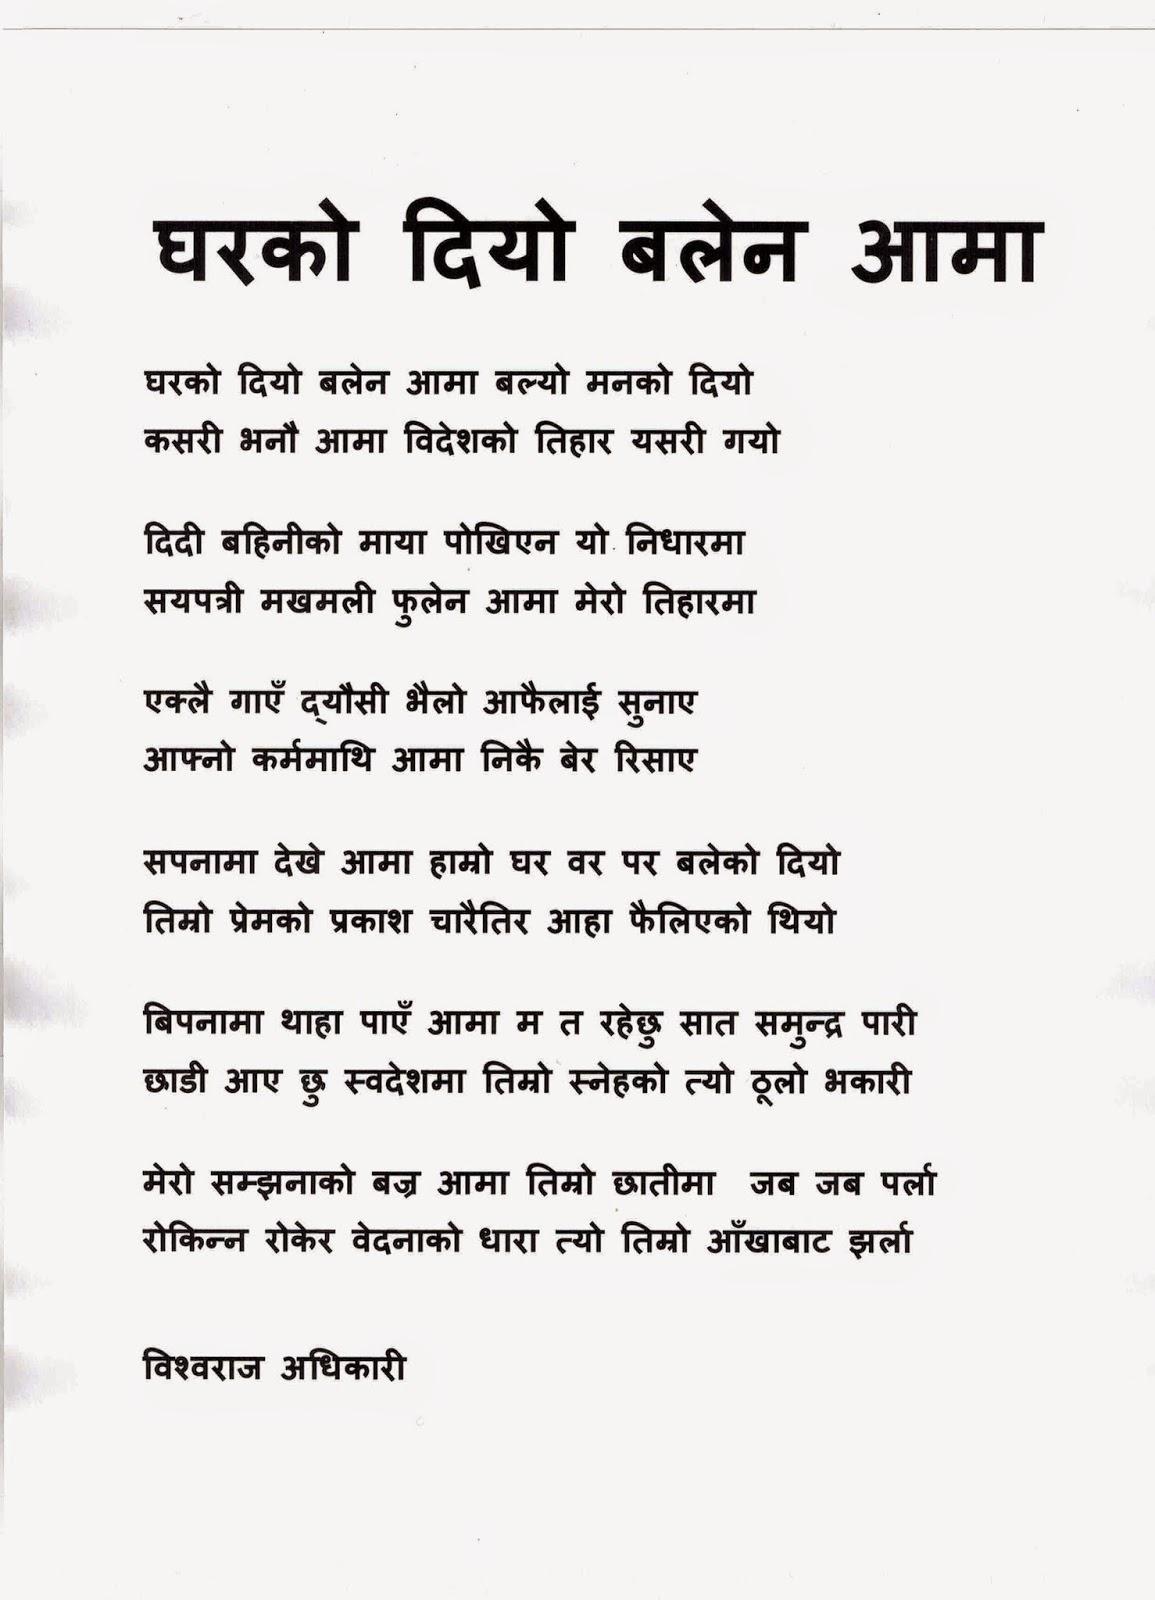 Bishwa Darpan: A Poem About Tihar Festival